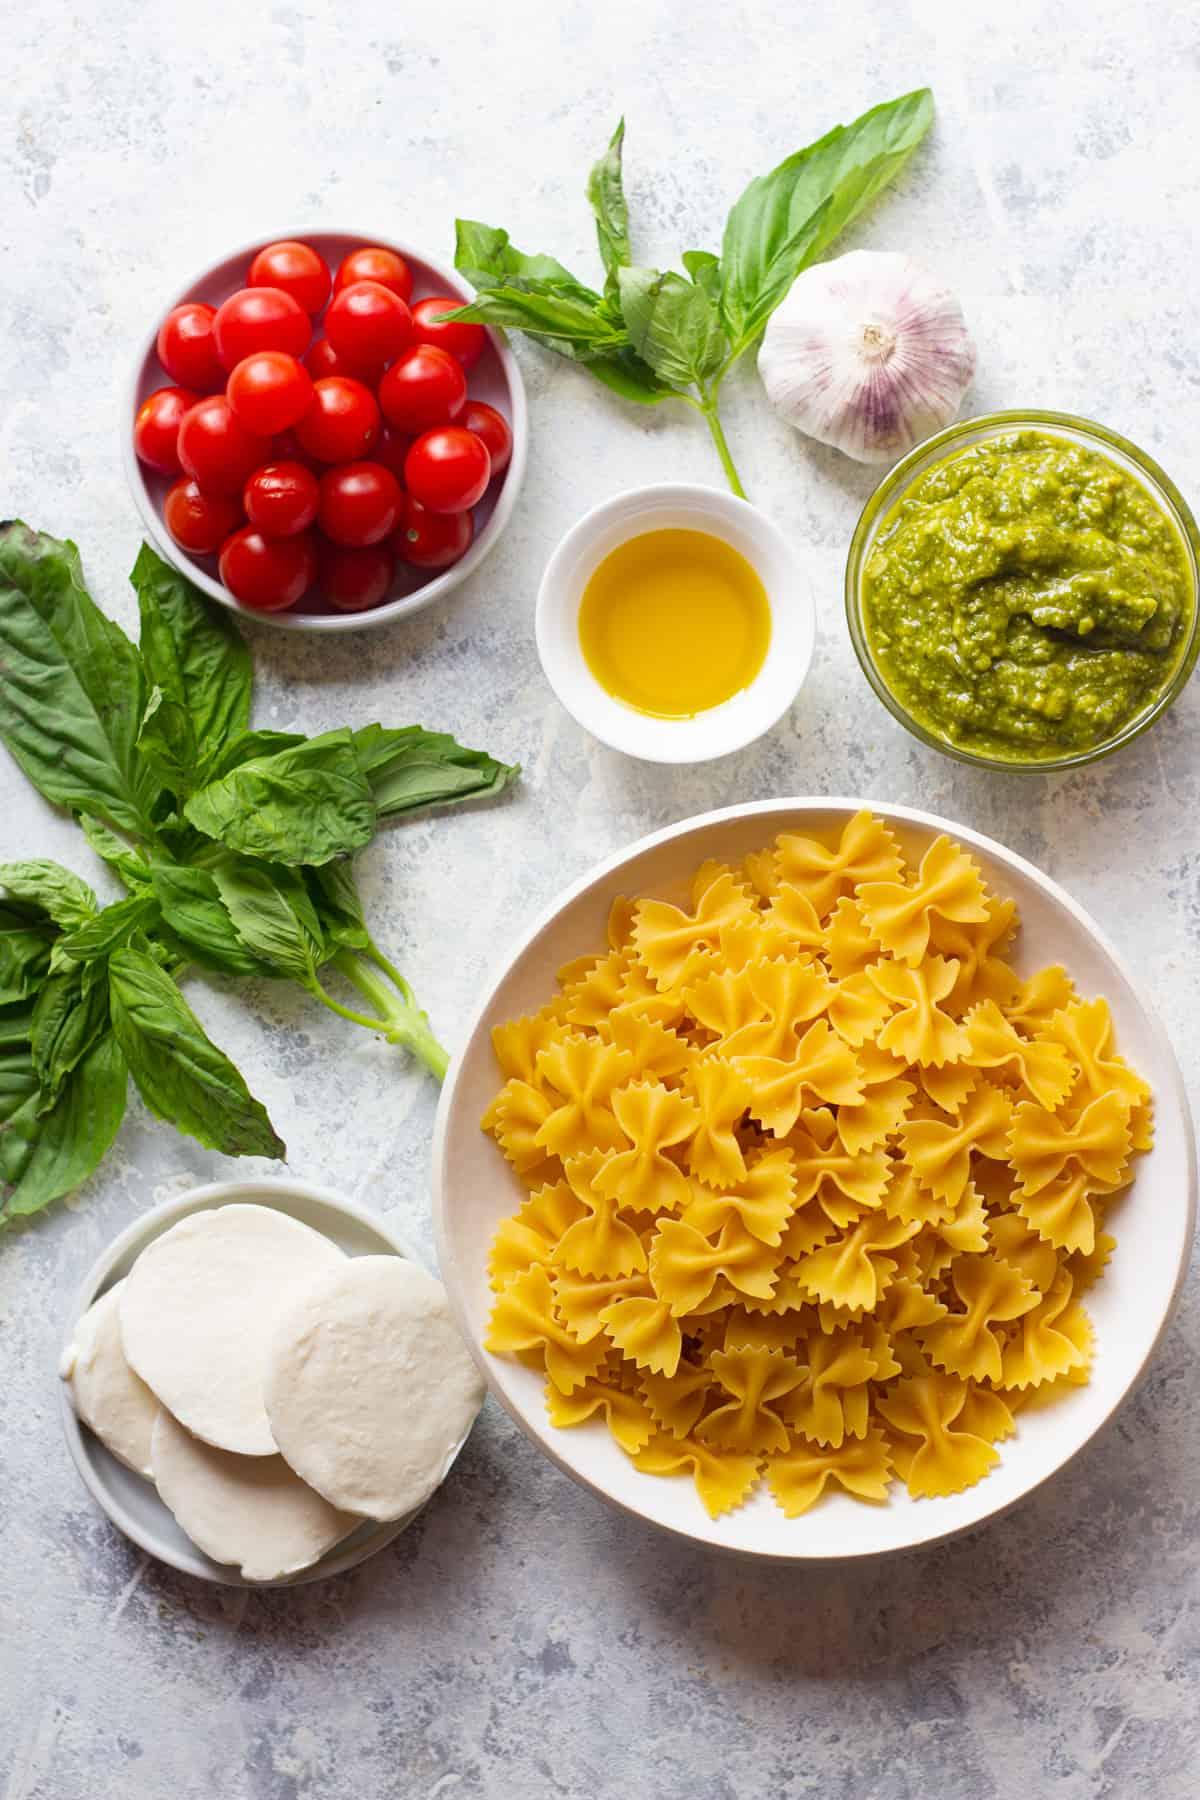 To make this recipe you need pasta, mozzarella, basil, tomatoes, pesto and olive oil.